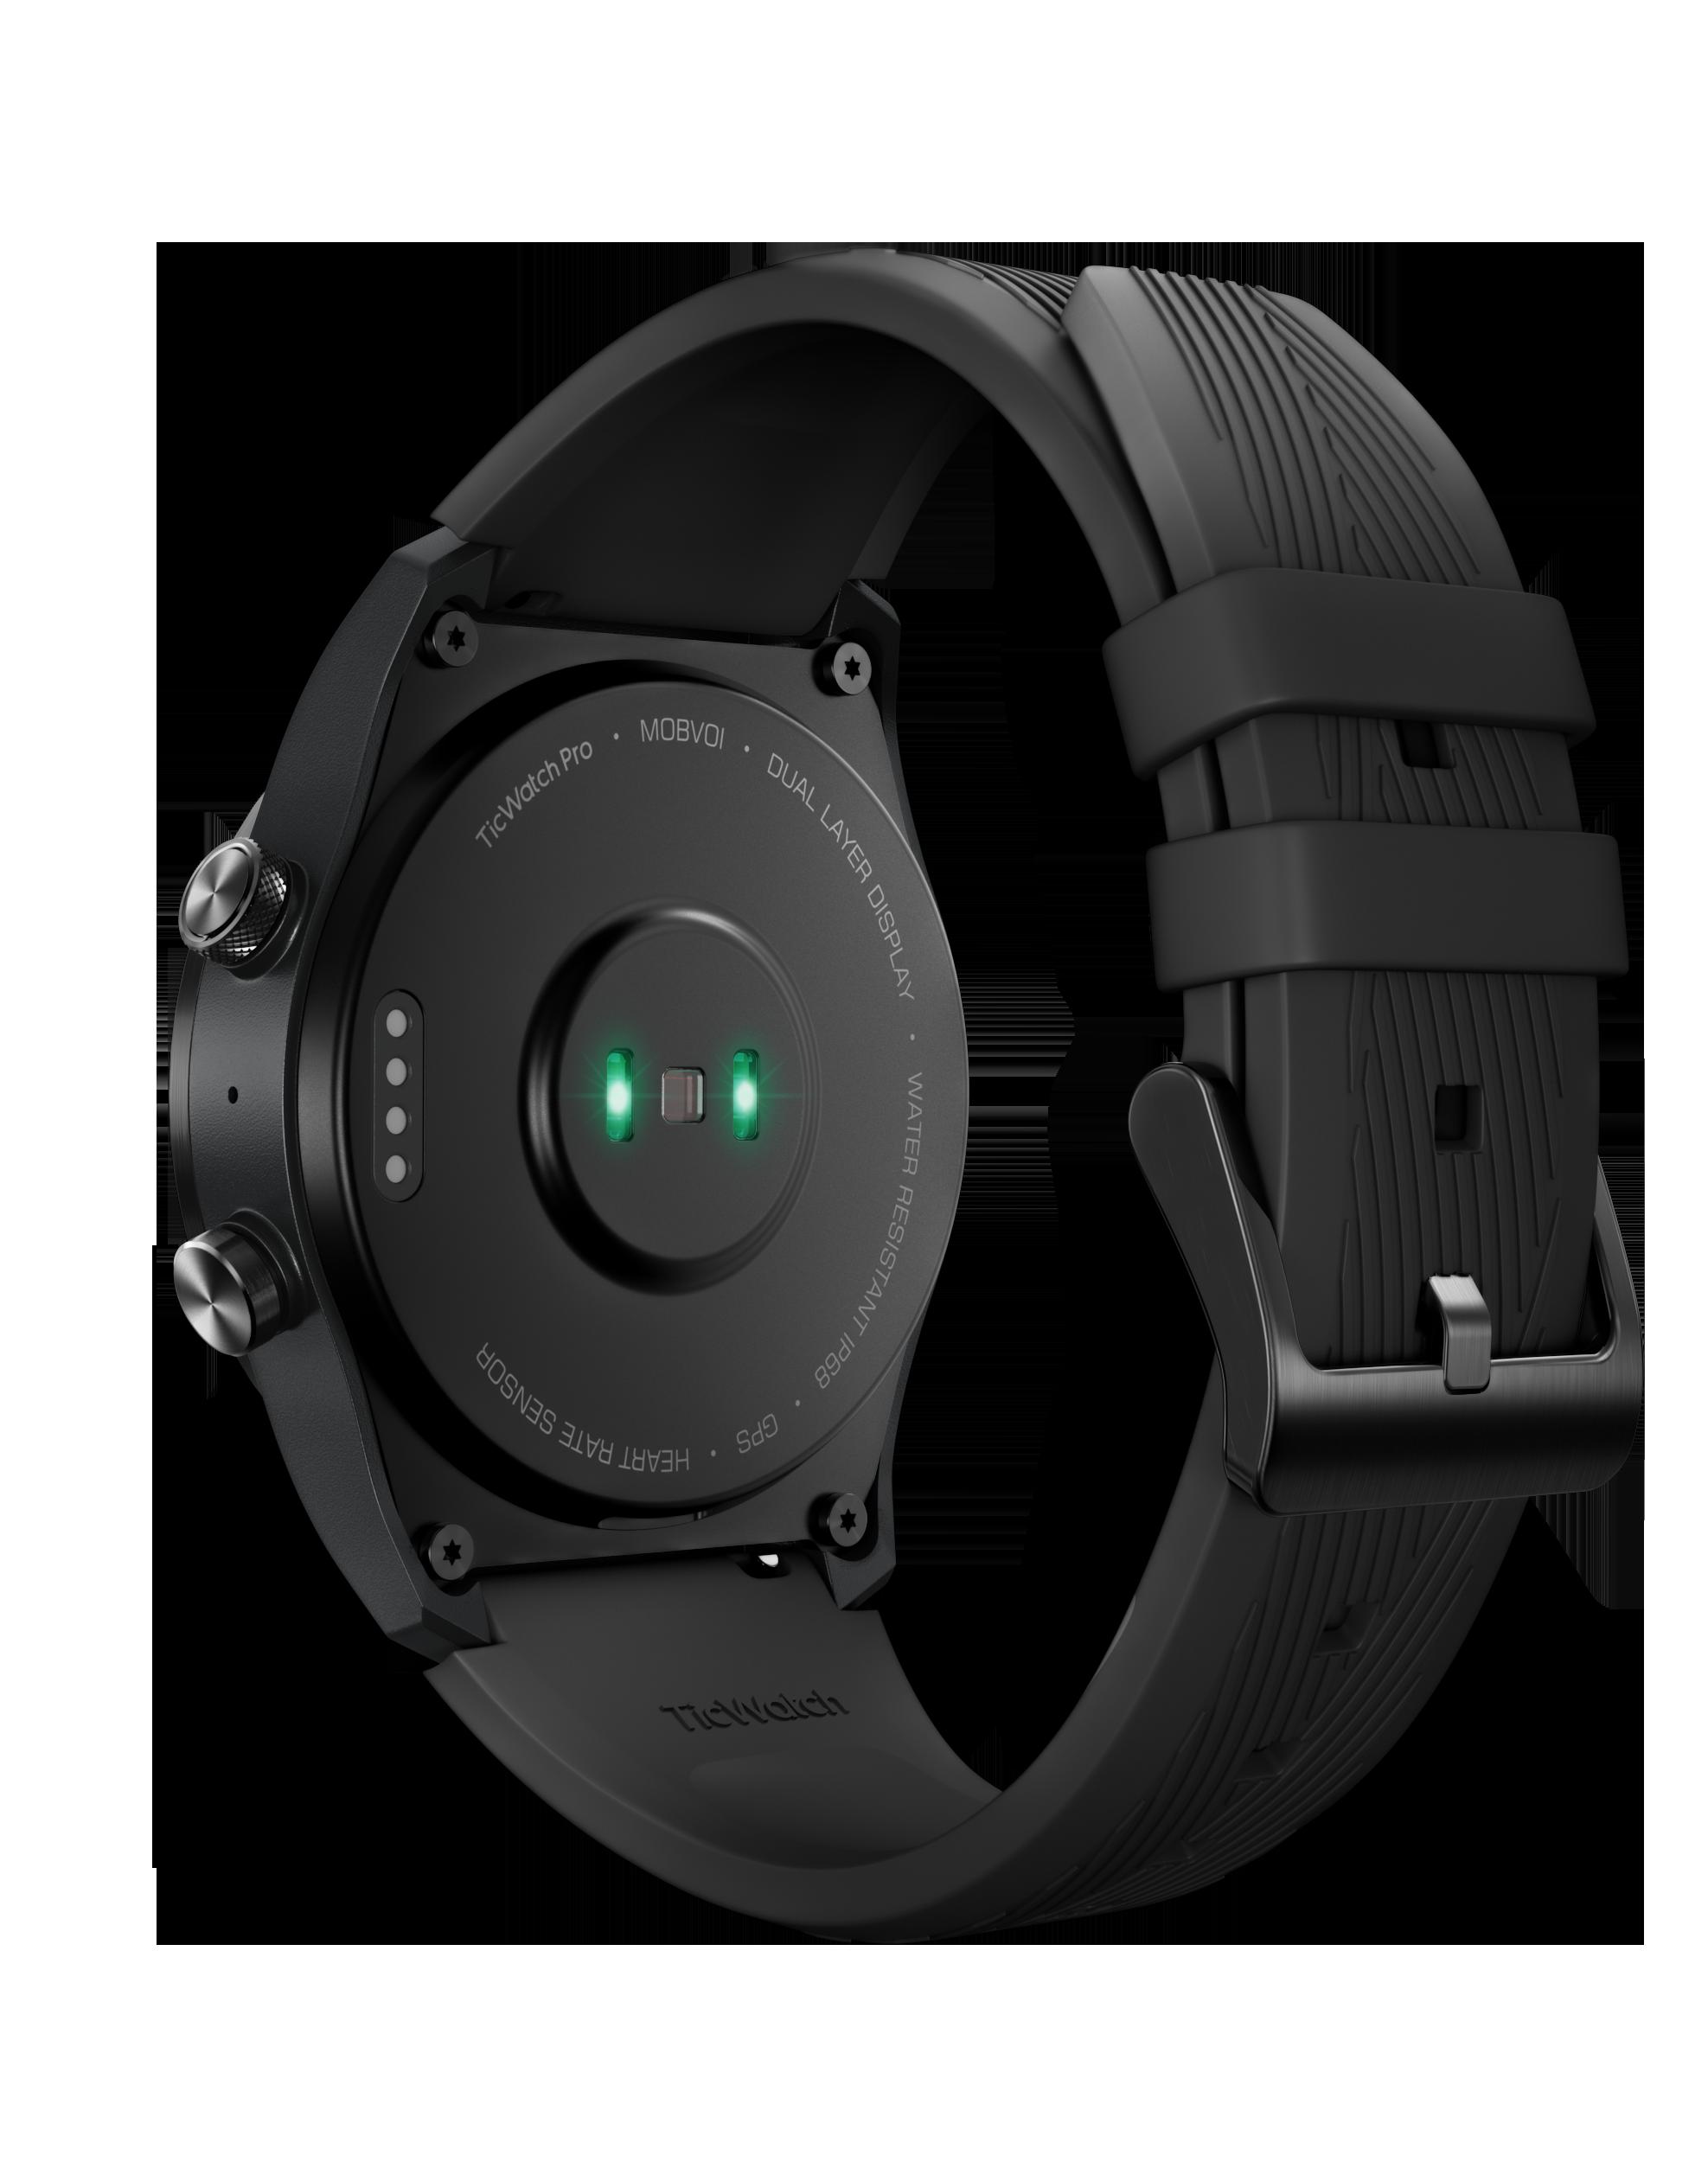 mobvoi ticwatch pro 4g heart rate sensor